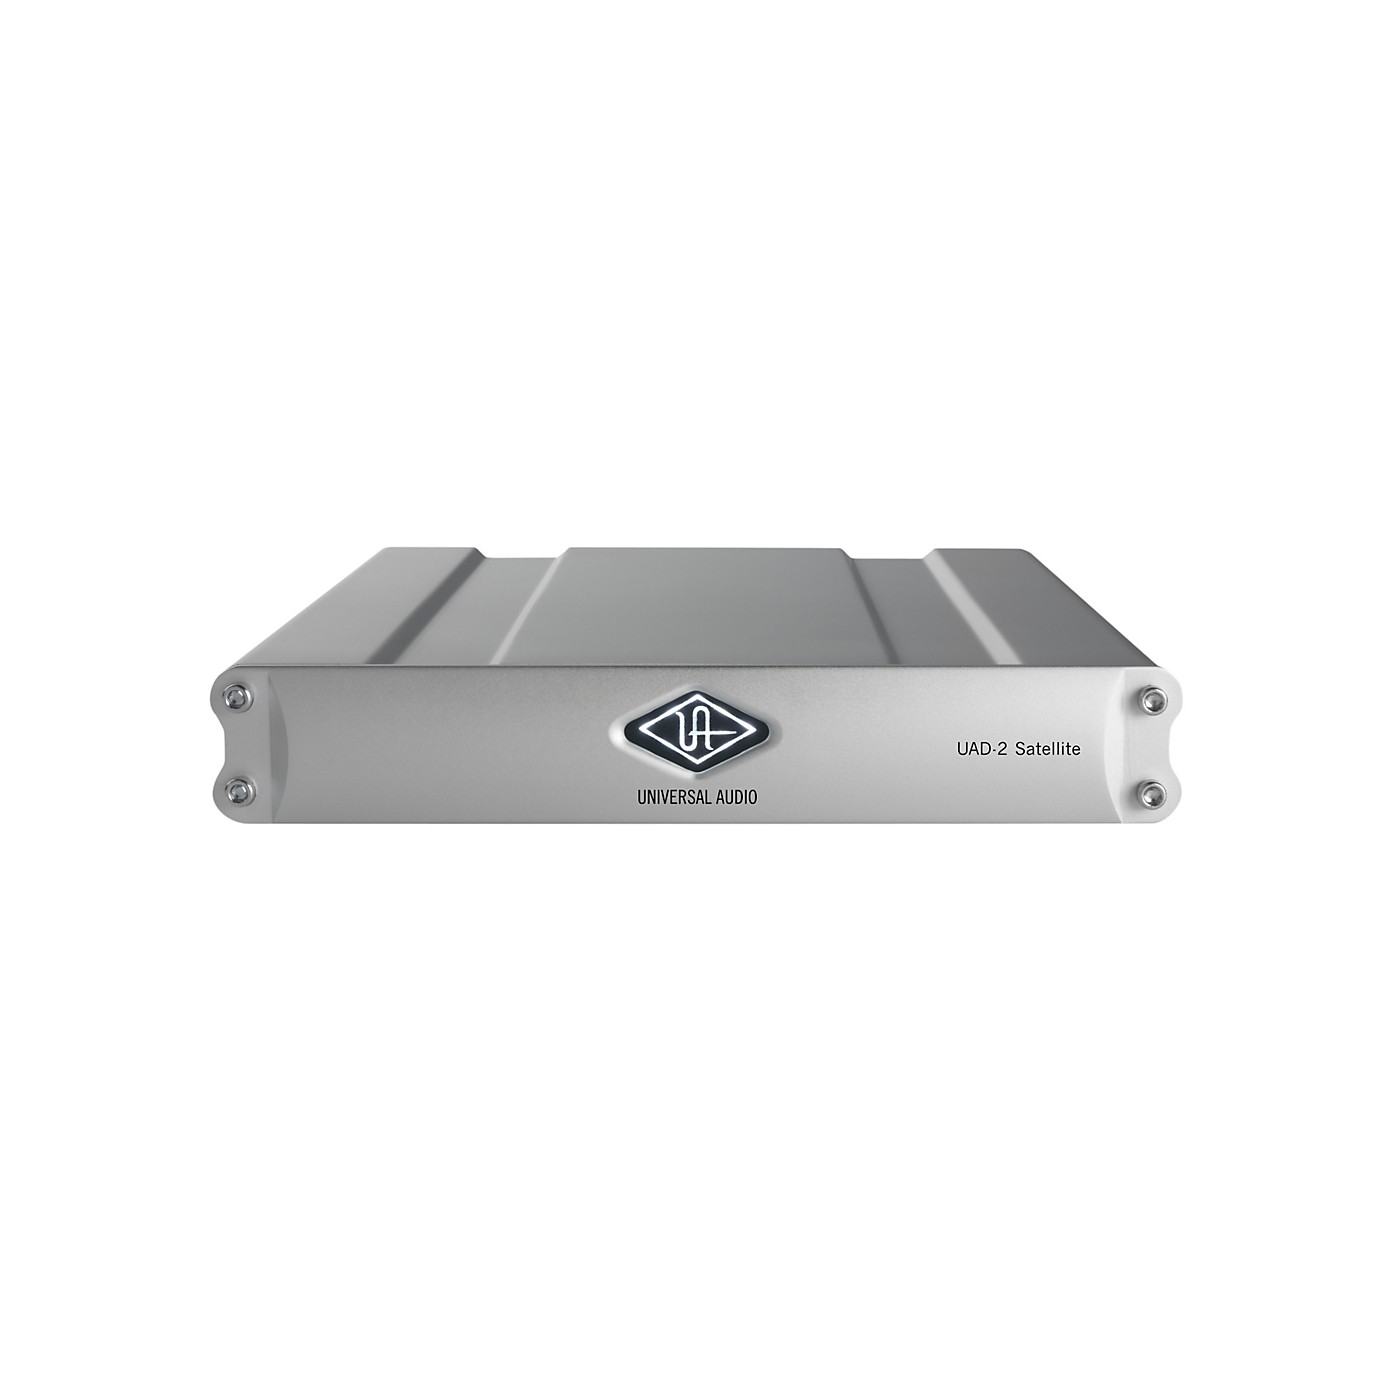 Universal Audio UAD-2 Satellite QUAD Core FireWire DSP Accelerator Package thumbnail